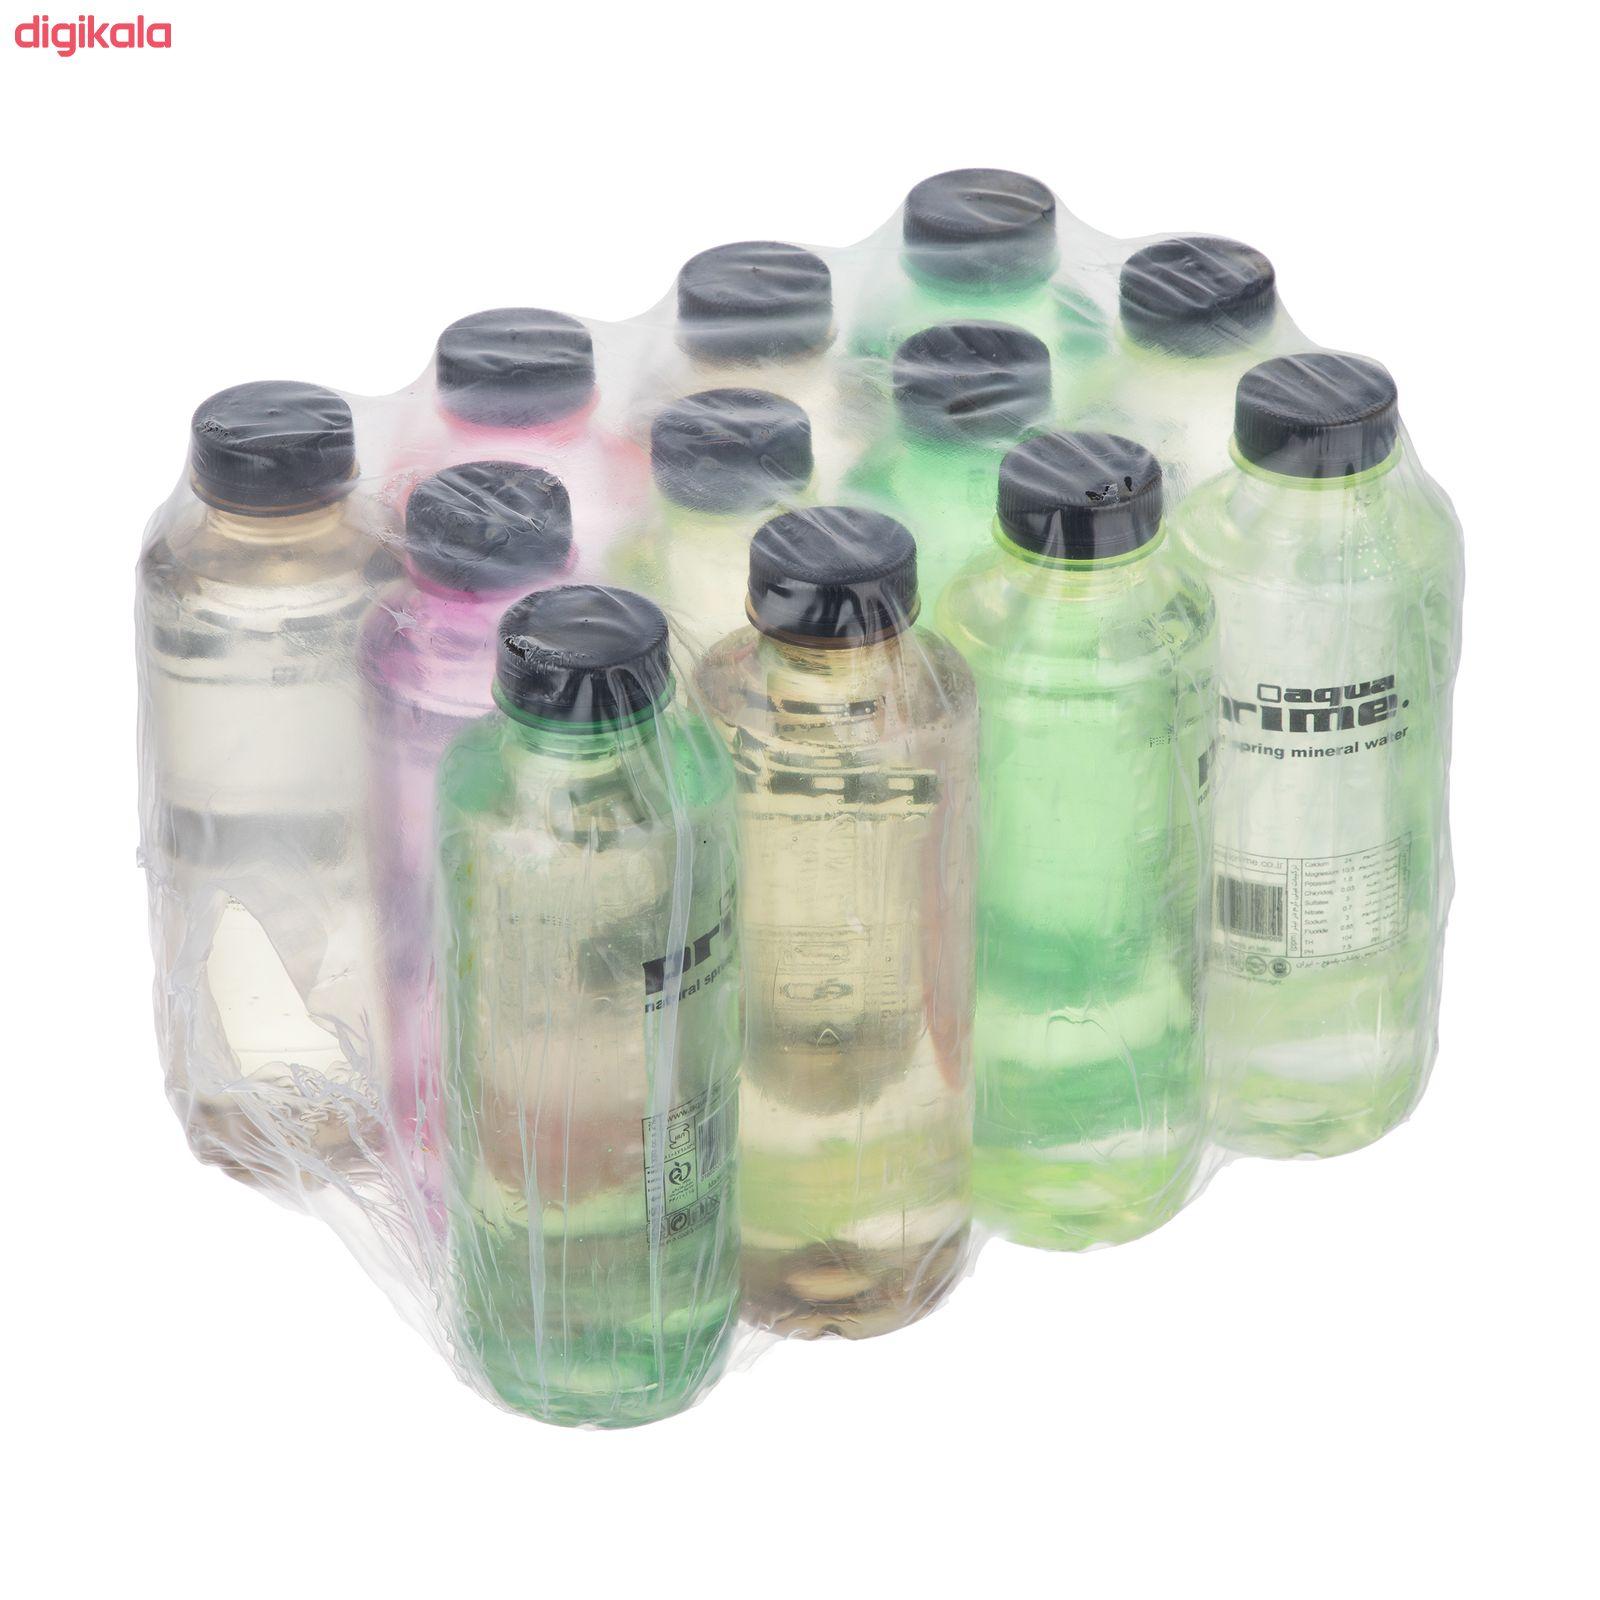 آب معدنی آکوا پرایم ویژه -300 میلی لیتر بسته 12 عددی main 1 3